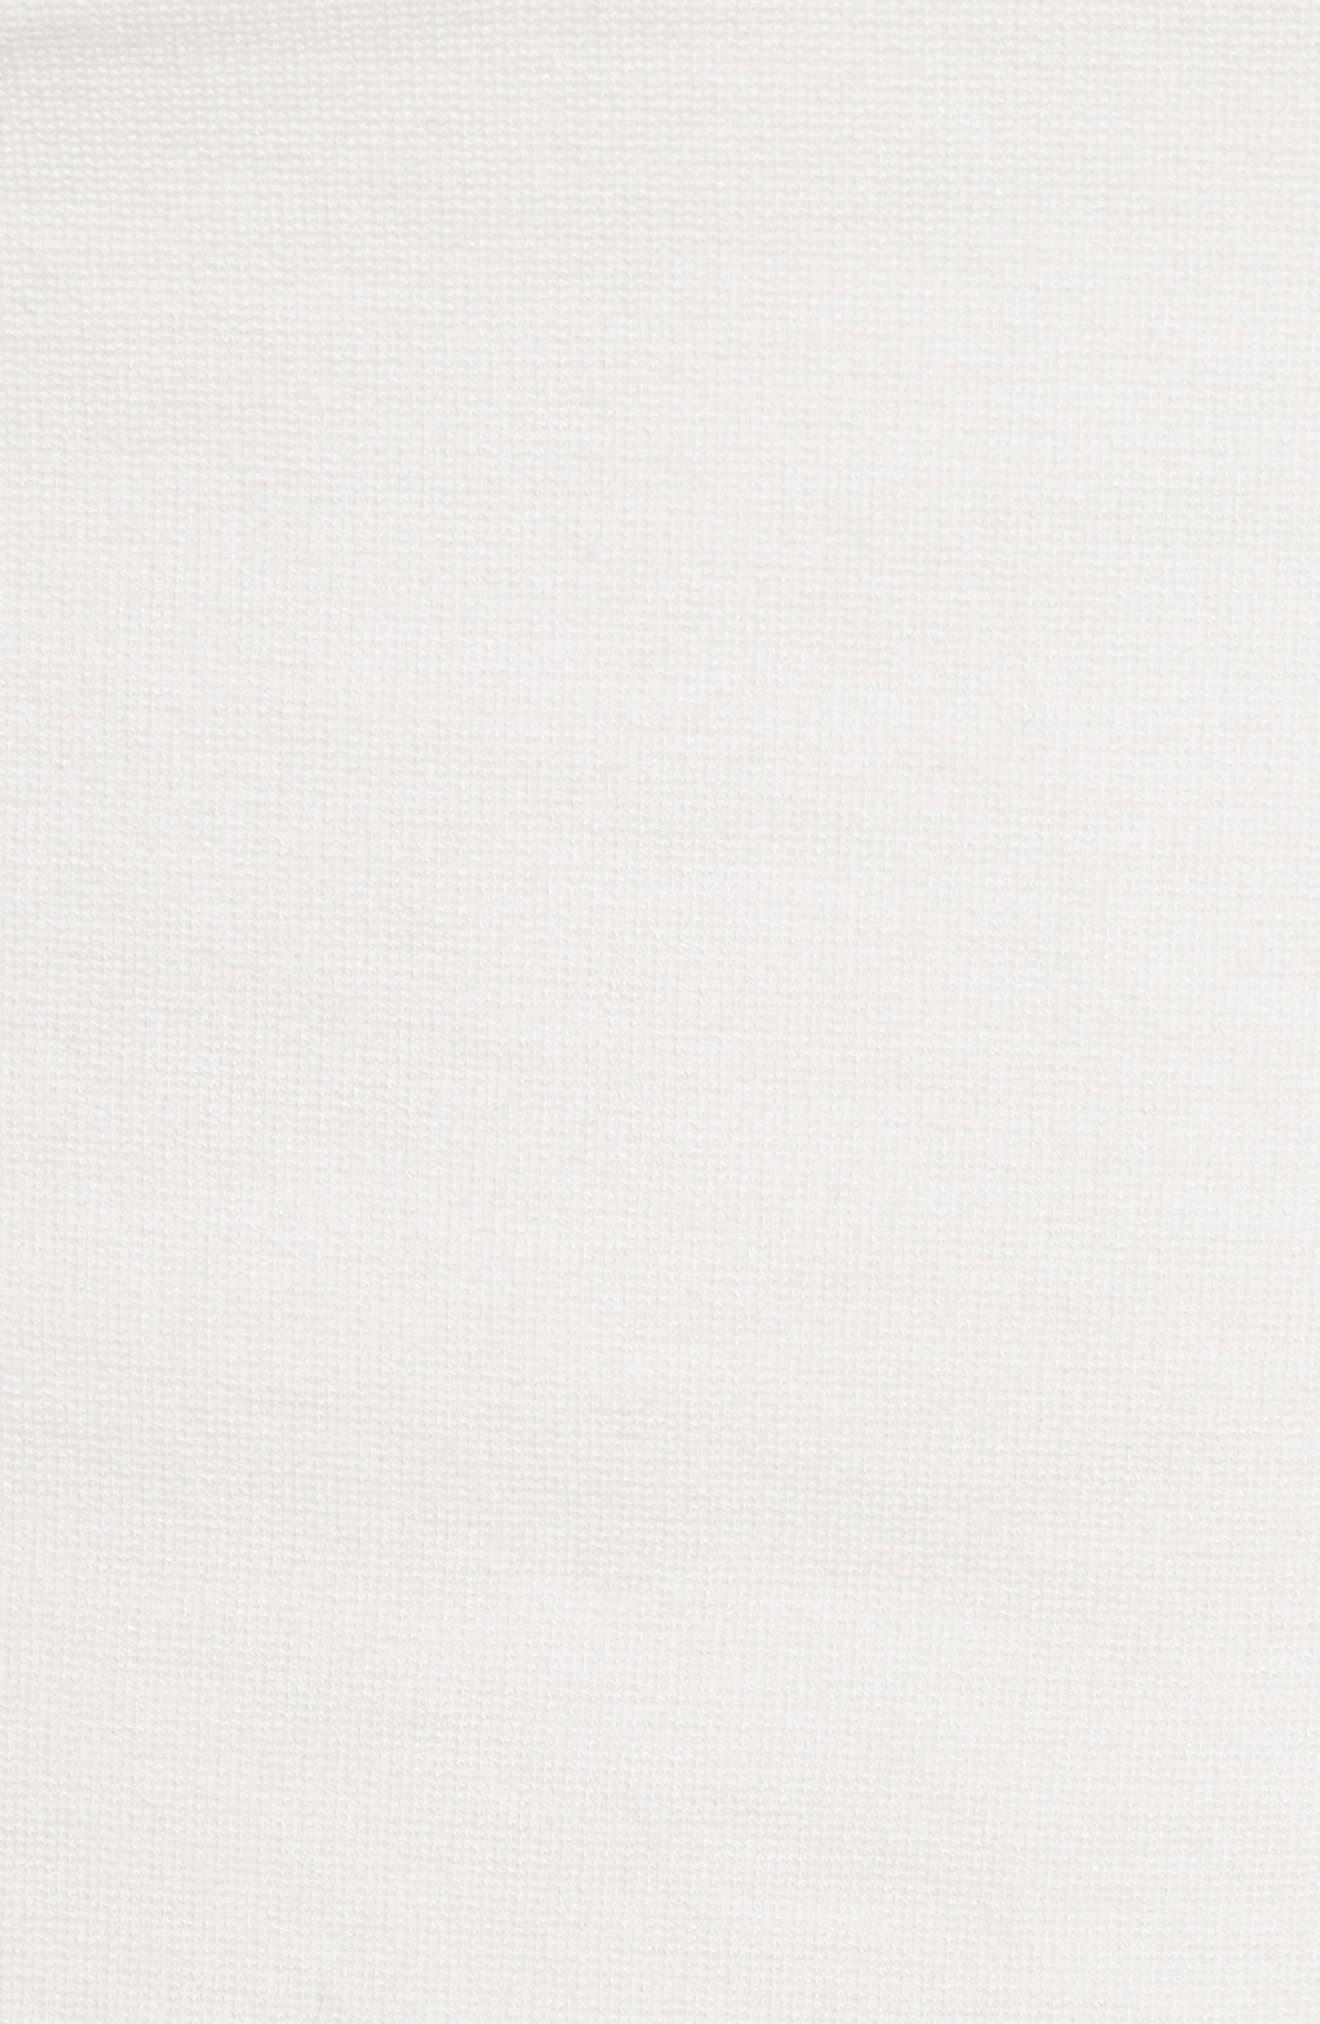 One-Shoulder Jersey Top,                             Alternate thumbnail 6, color,                             Black/ Ivory